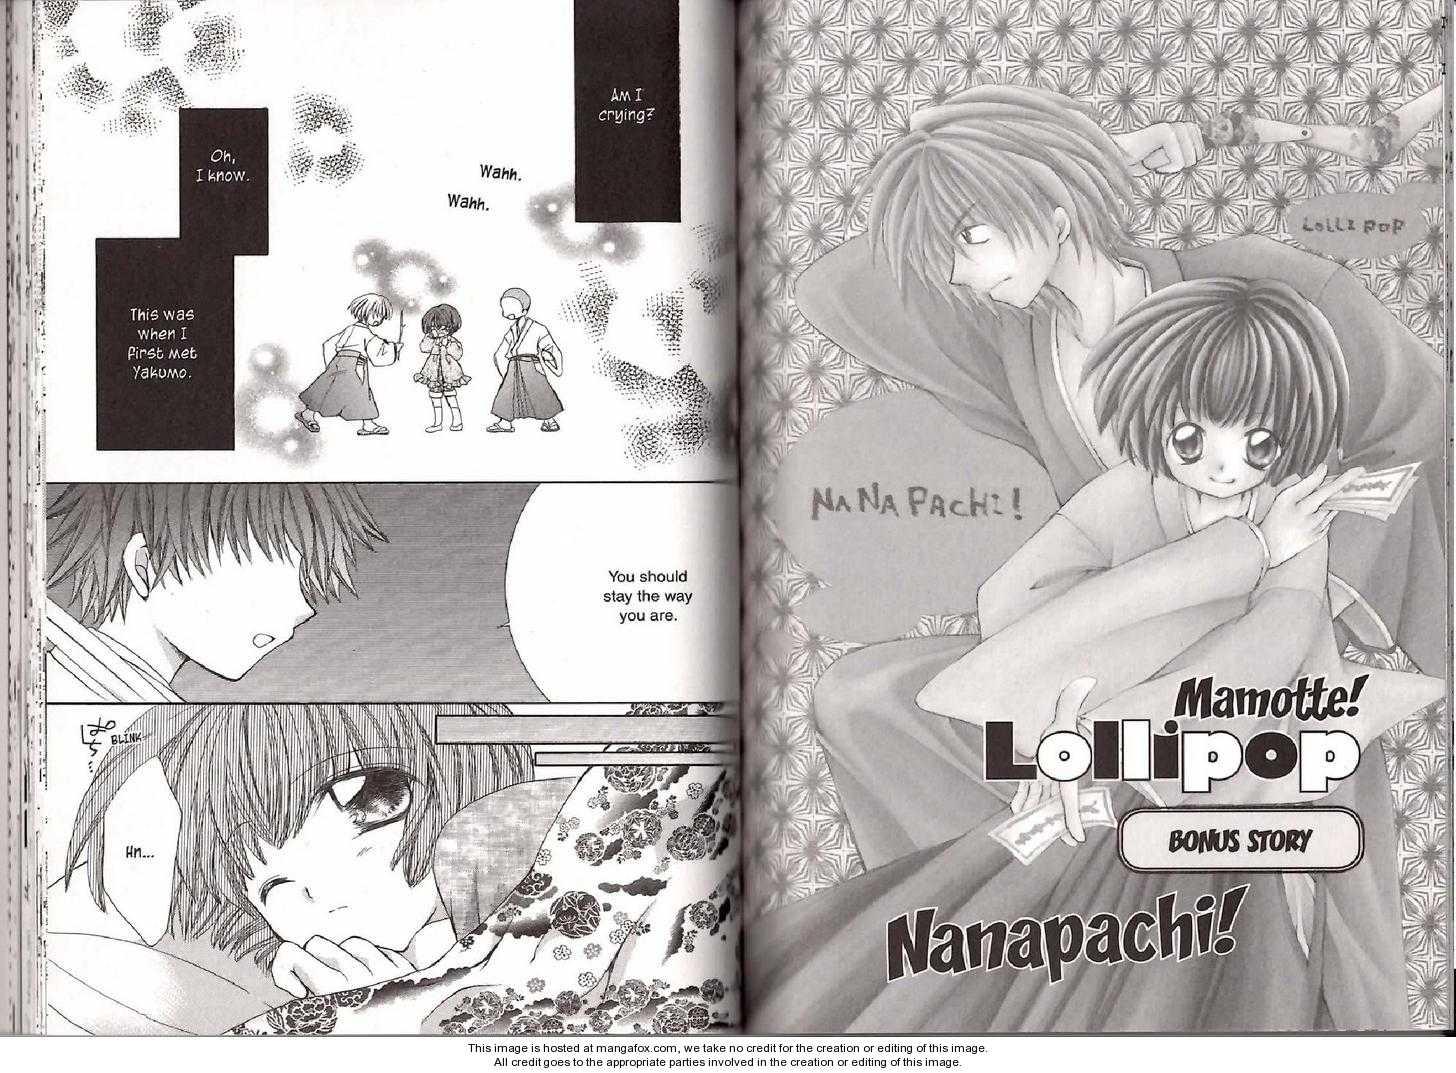 Mamotte! Lollipop 22.2 Page 1